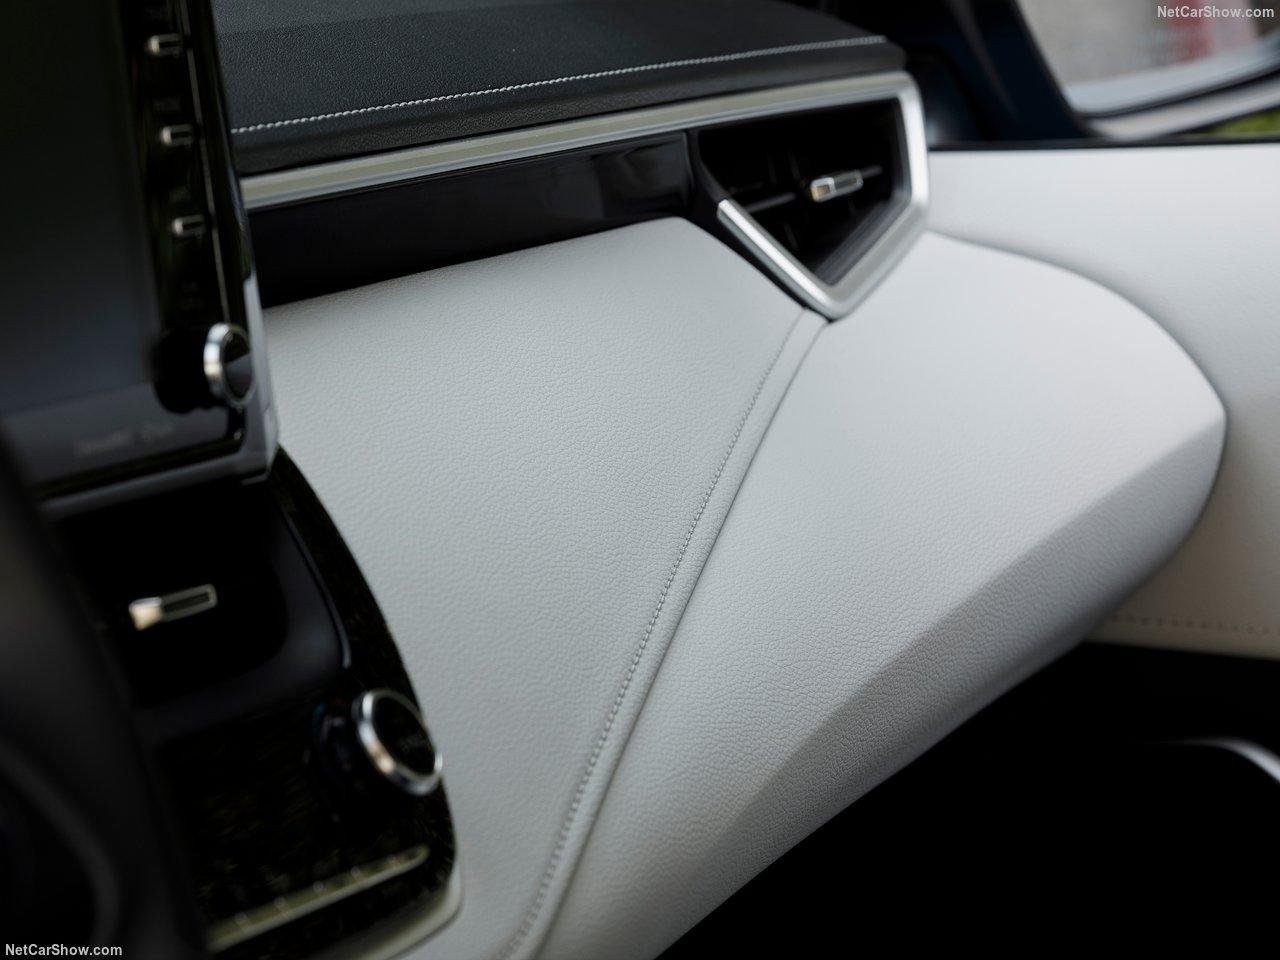 Toyota-Corolla_Hatchback-2019-1280-46.jpg